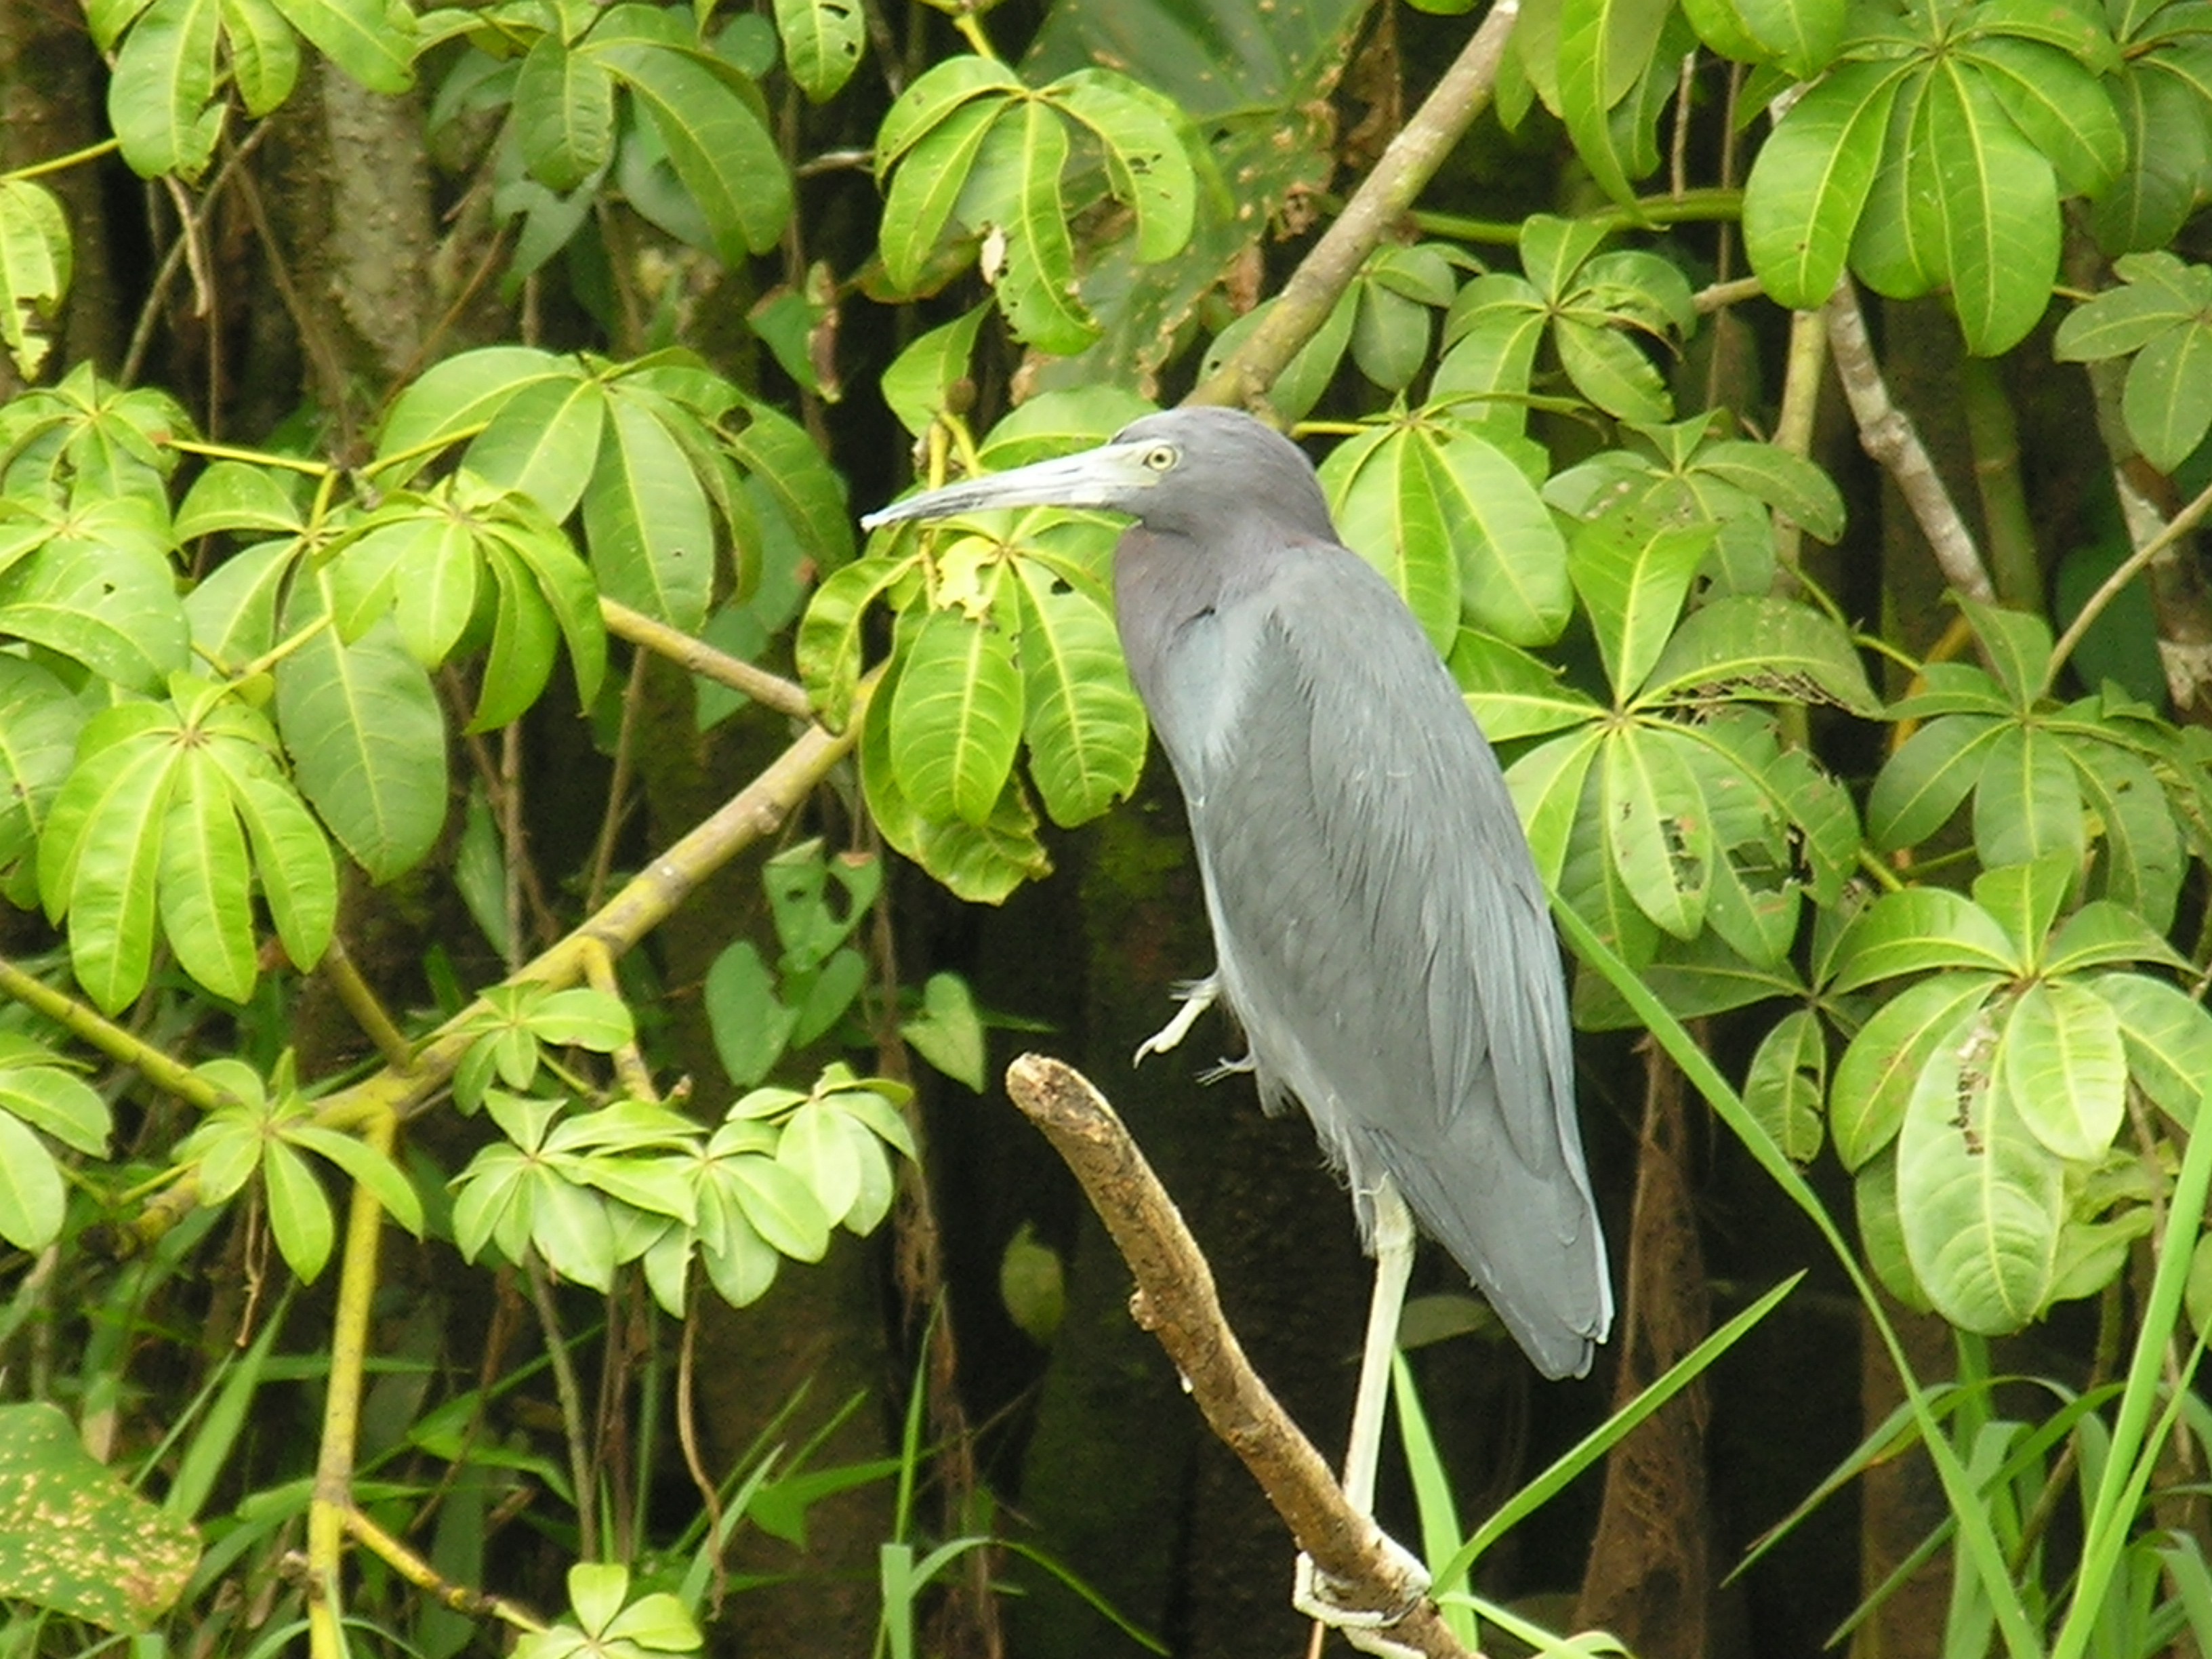 Birdwatching Tour in Nicaragua